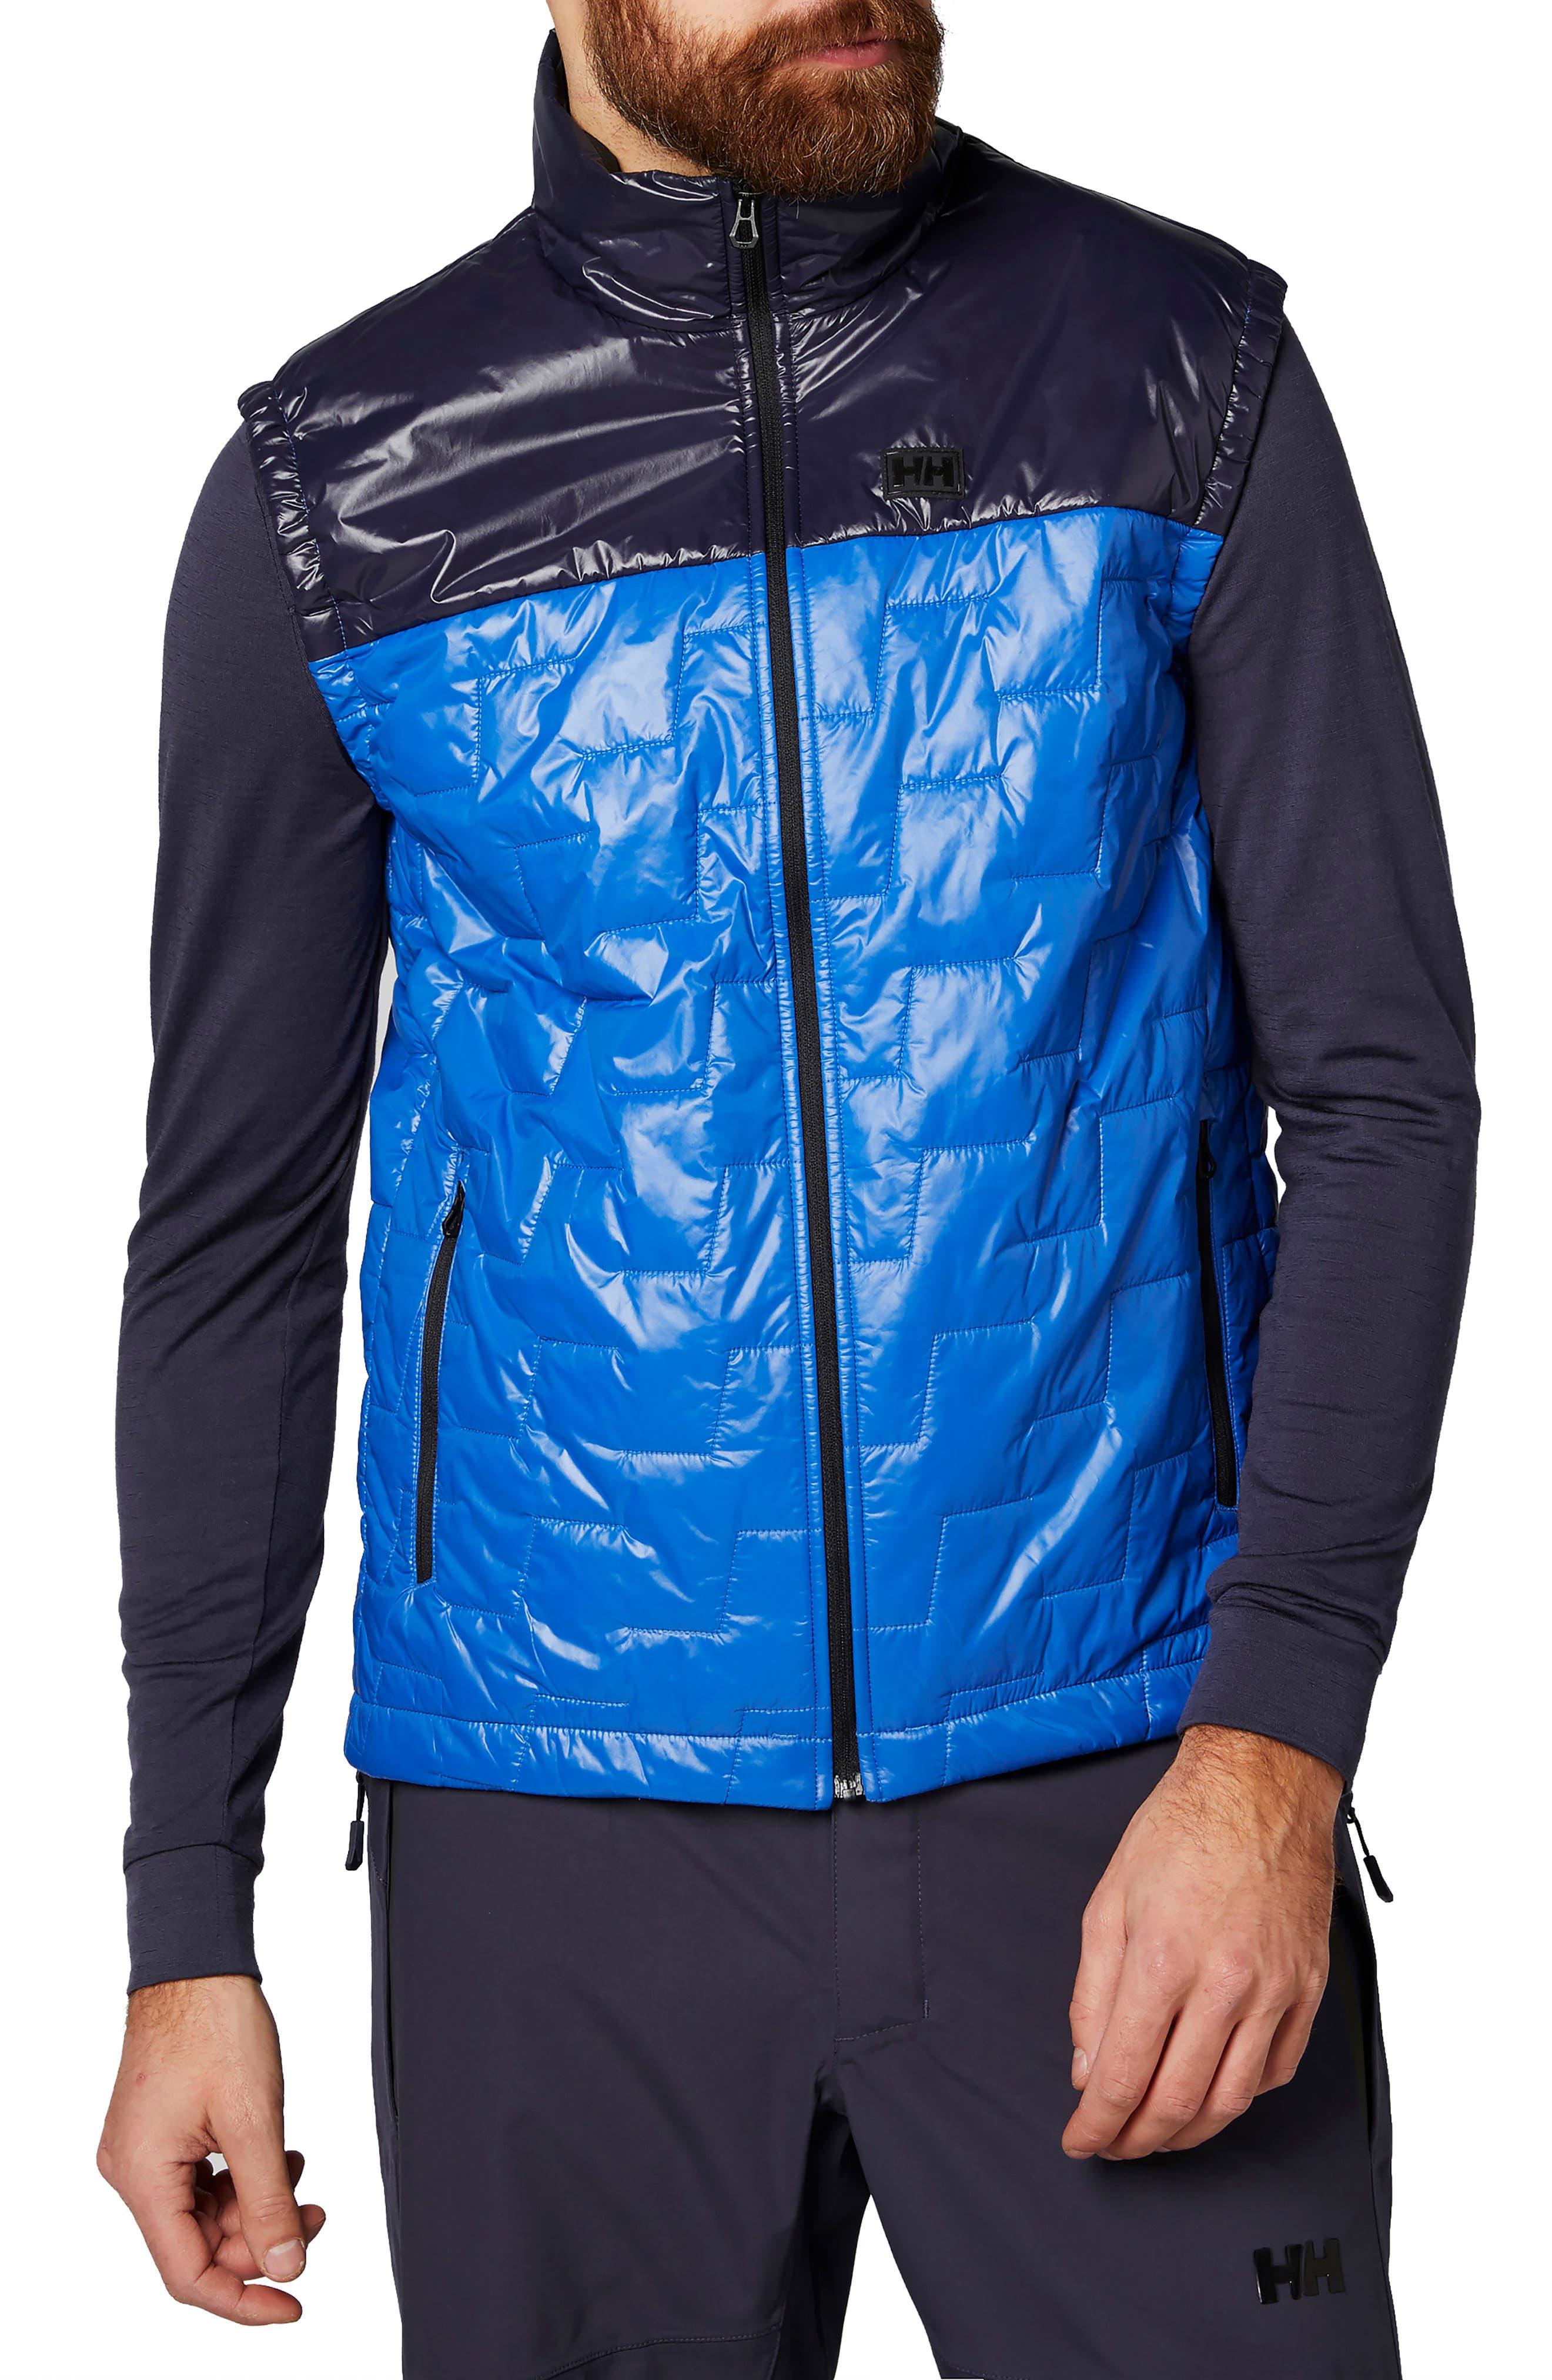 Liftaloft<sup>™</sup> Hybrid Water- & Wind-Resistant Insulator Vest,                             Main thumbnail 1, color,                             OLYMPIAN BLUE